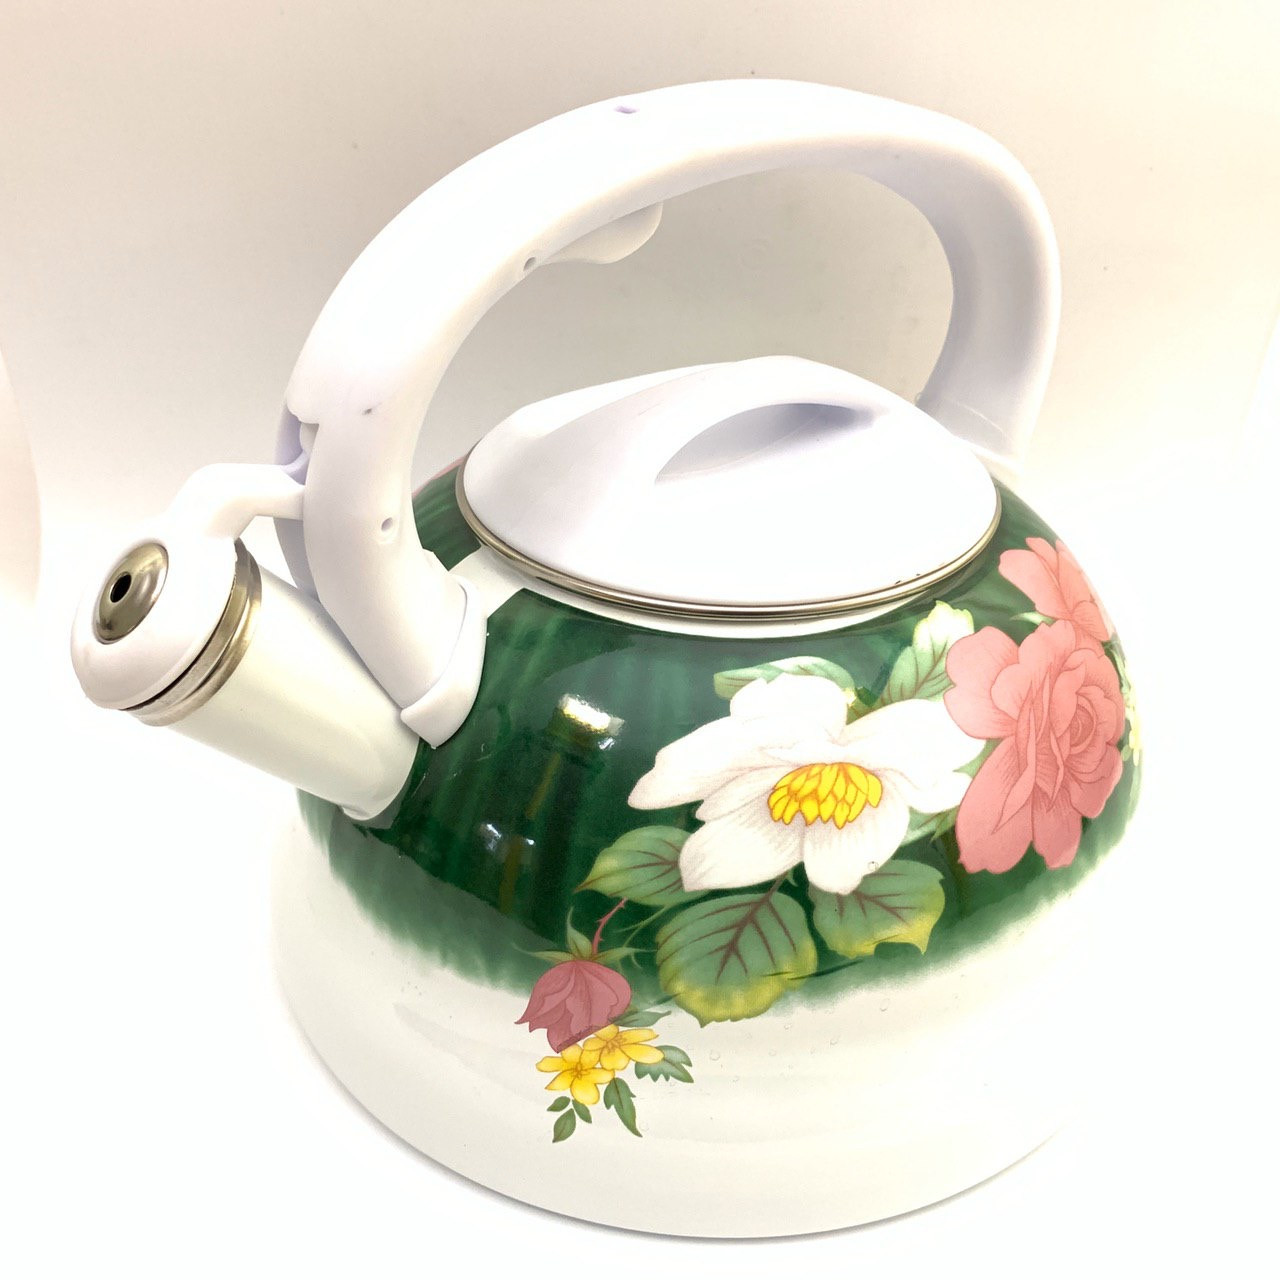 Чайник с свистком Hoffner 4932 Wild Flowers 3,3 литра, индукцуя, газ, электро, стекло